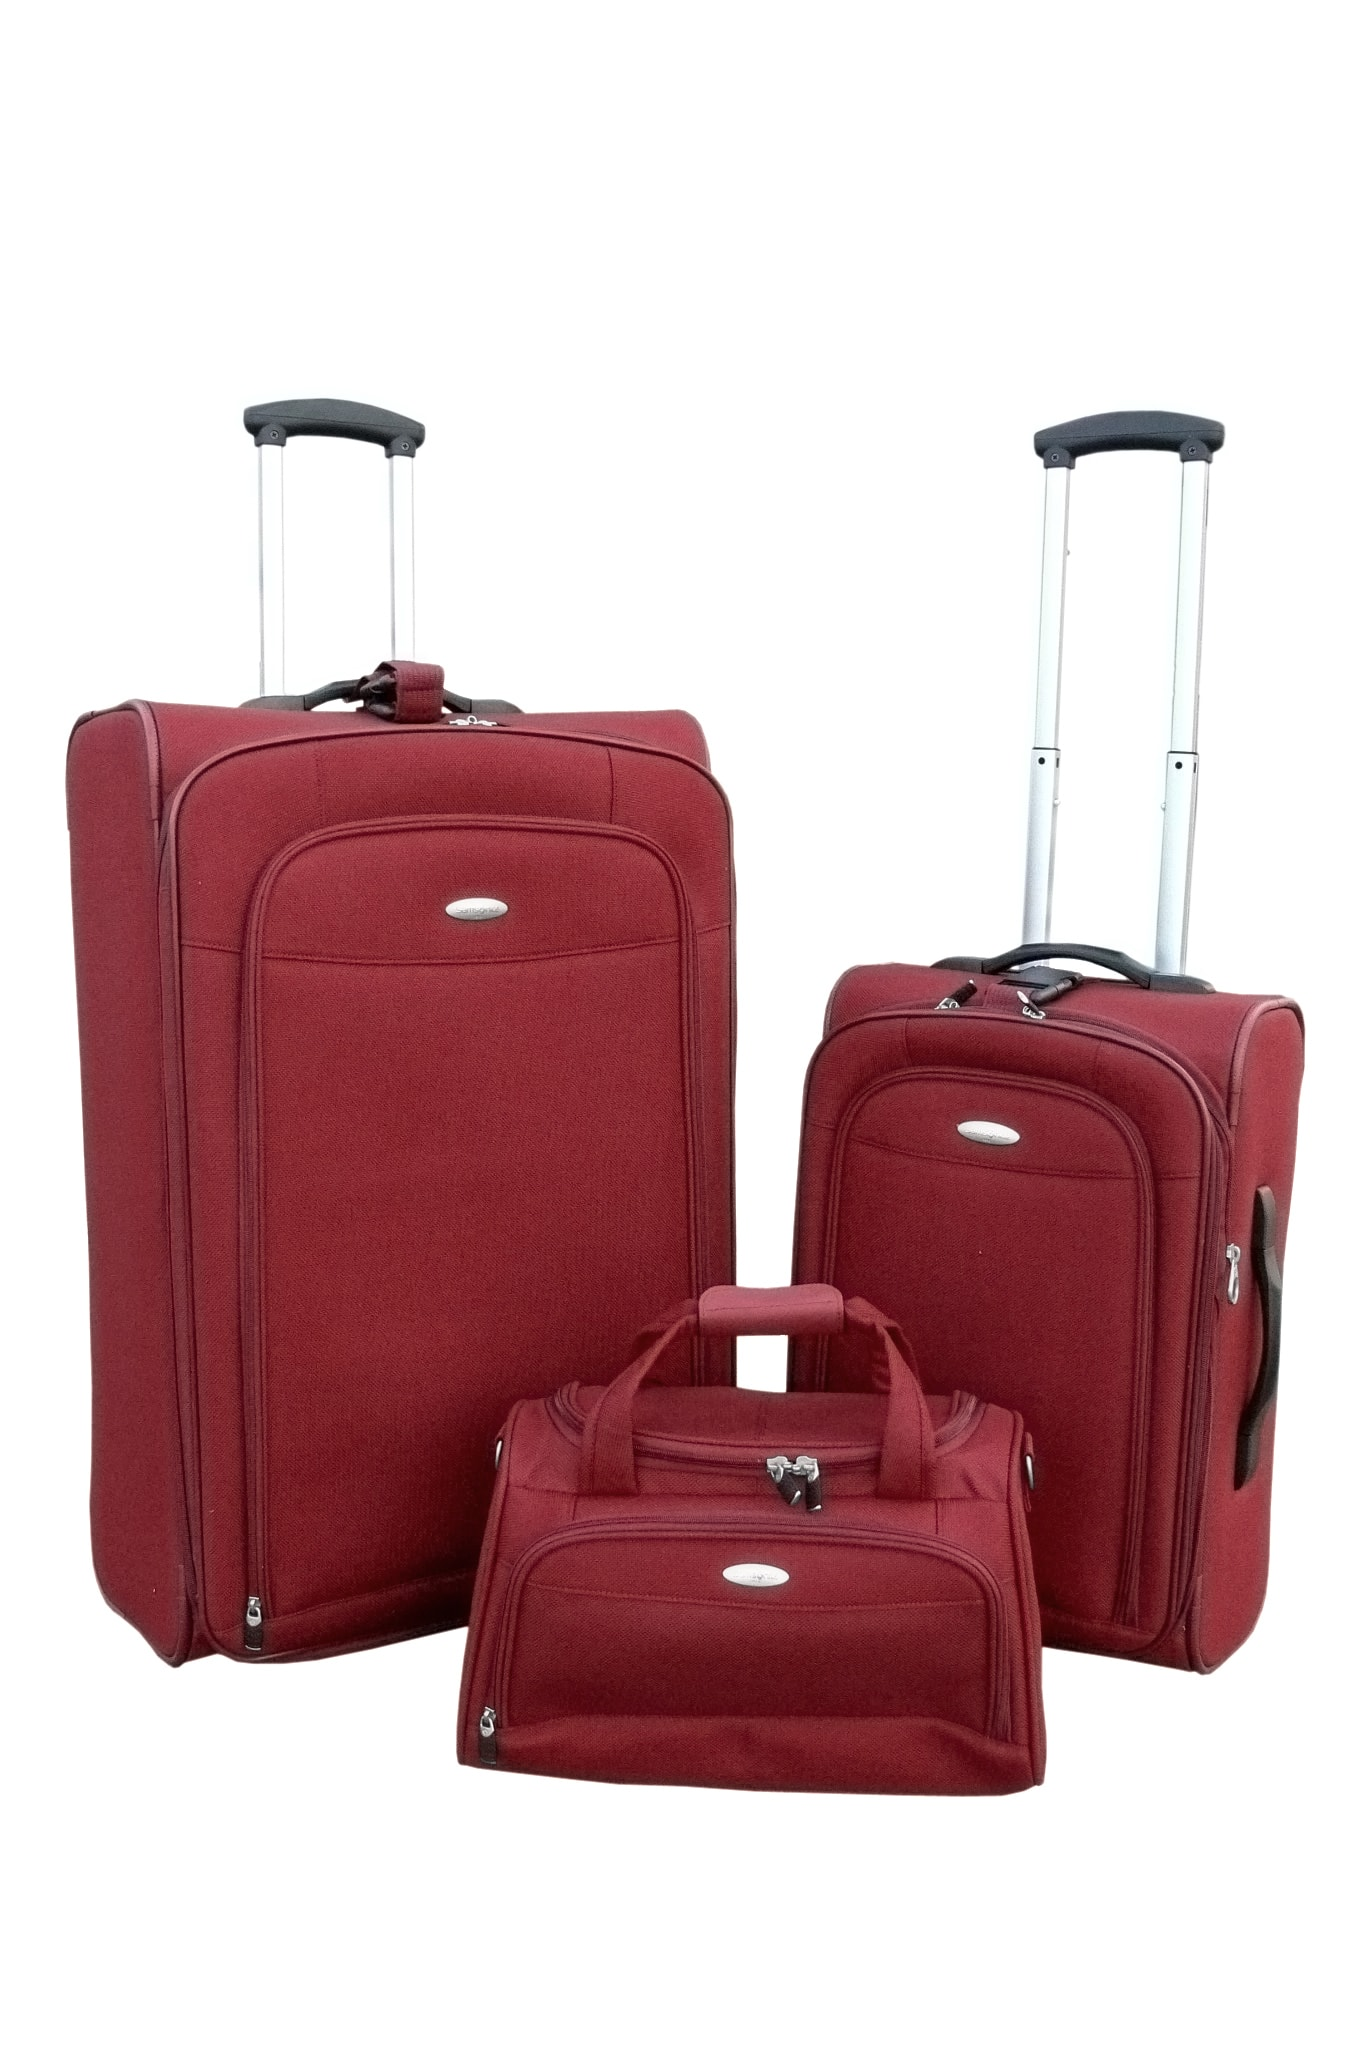 Samsonite Elevation 3 Pack Soft Side Luggage Set Free